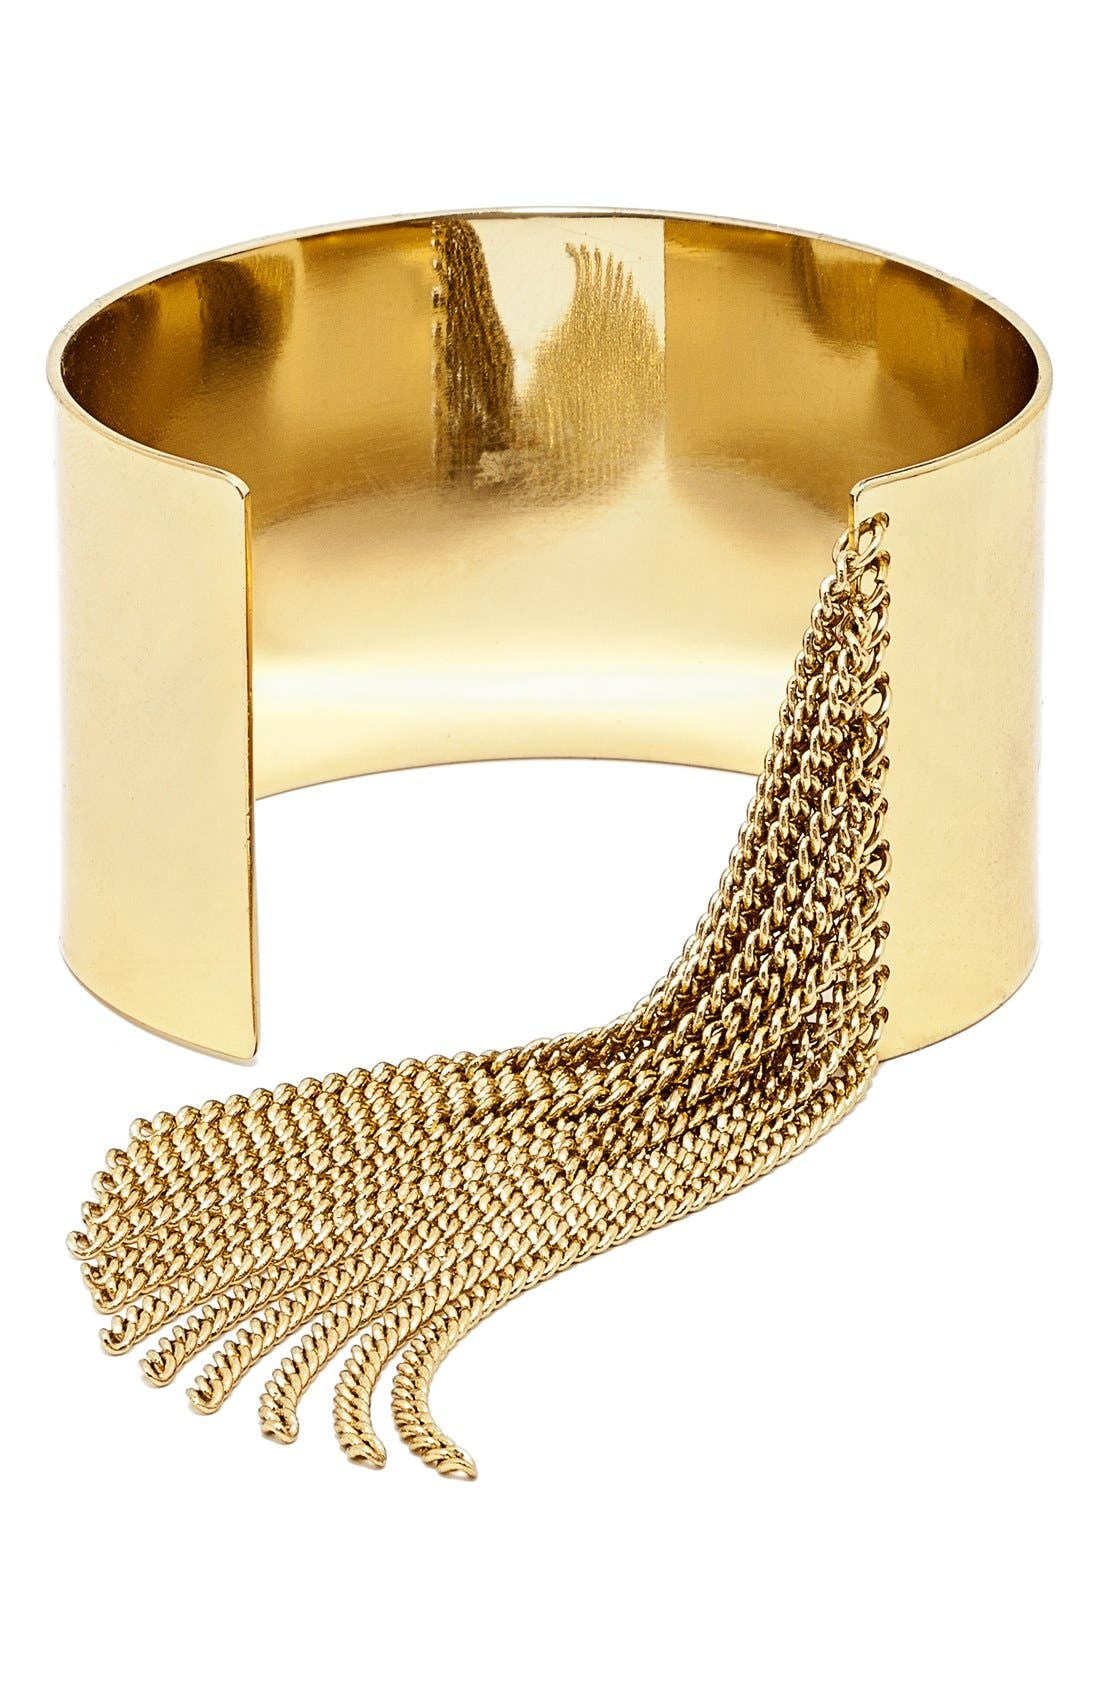 Alternate Image 1 Selected - BaubleBar'Cowgirl' Cuff Bracelet